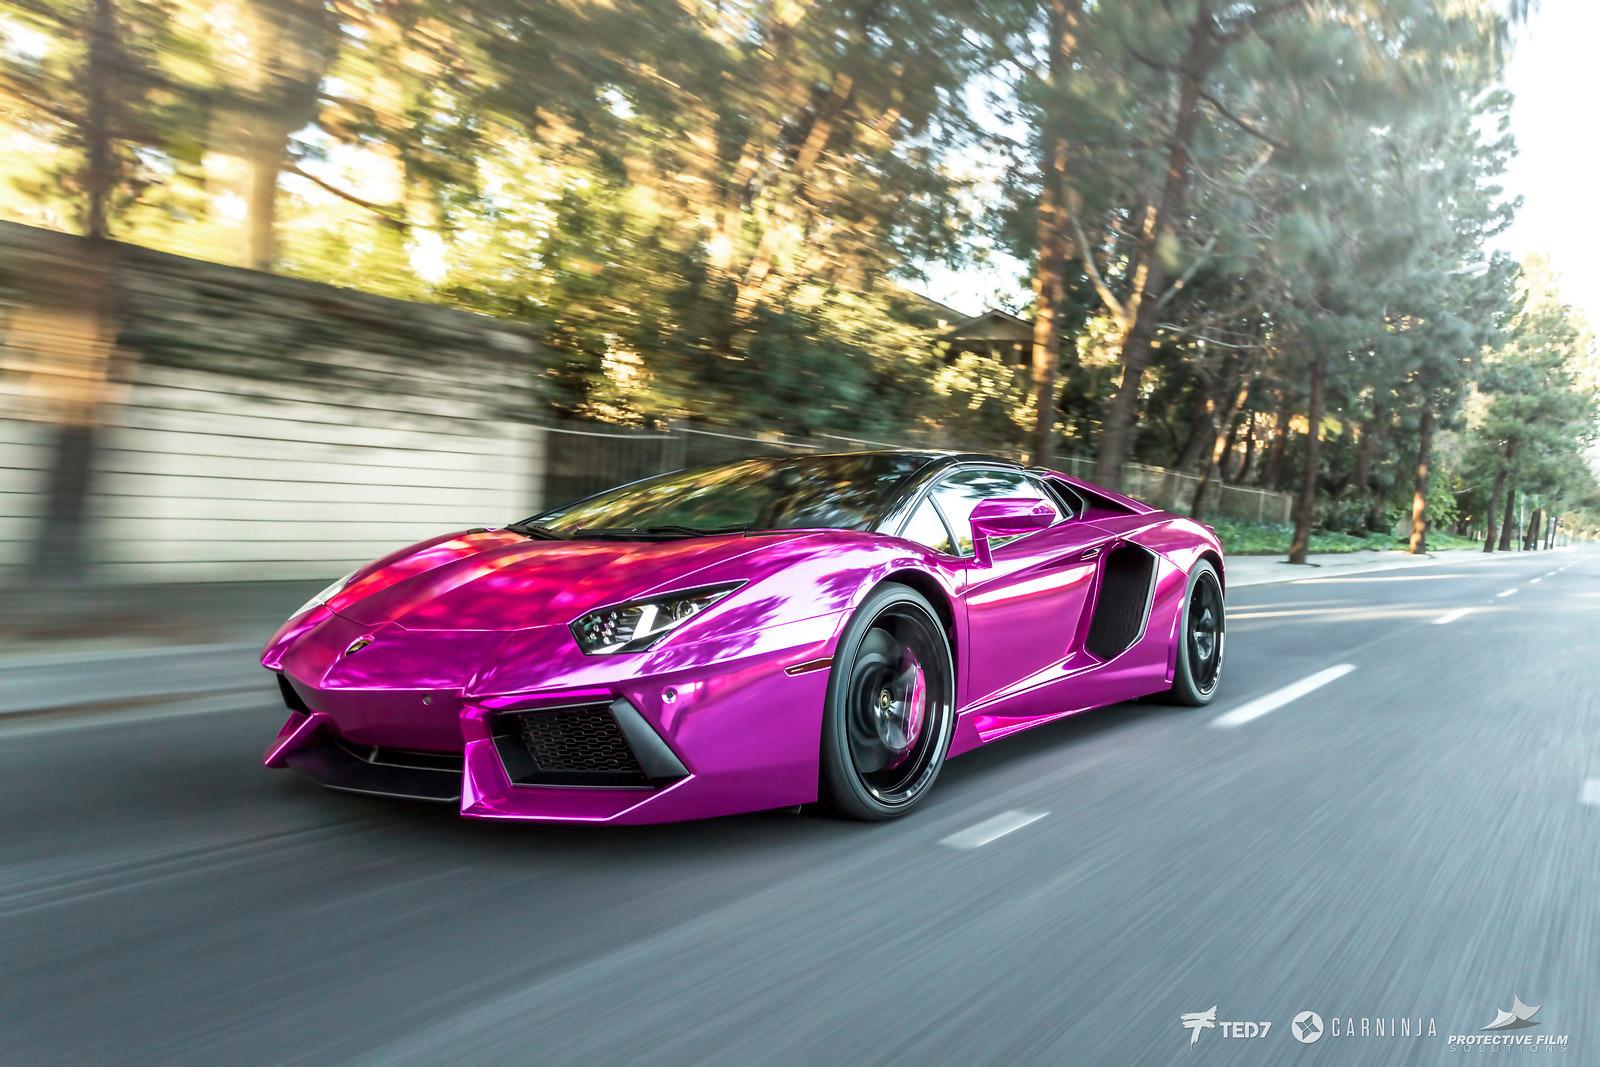 Lamborghini Aventador Rolling - Windshield Protection